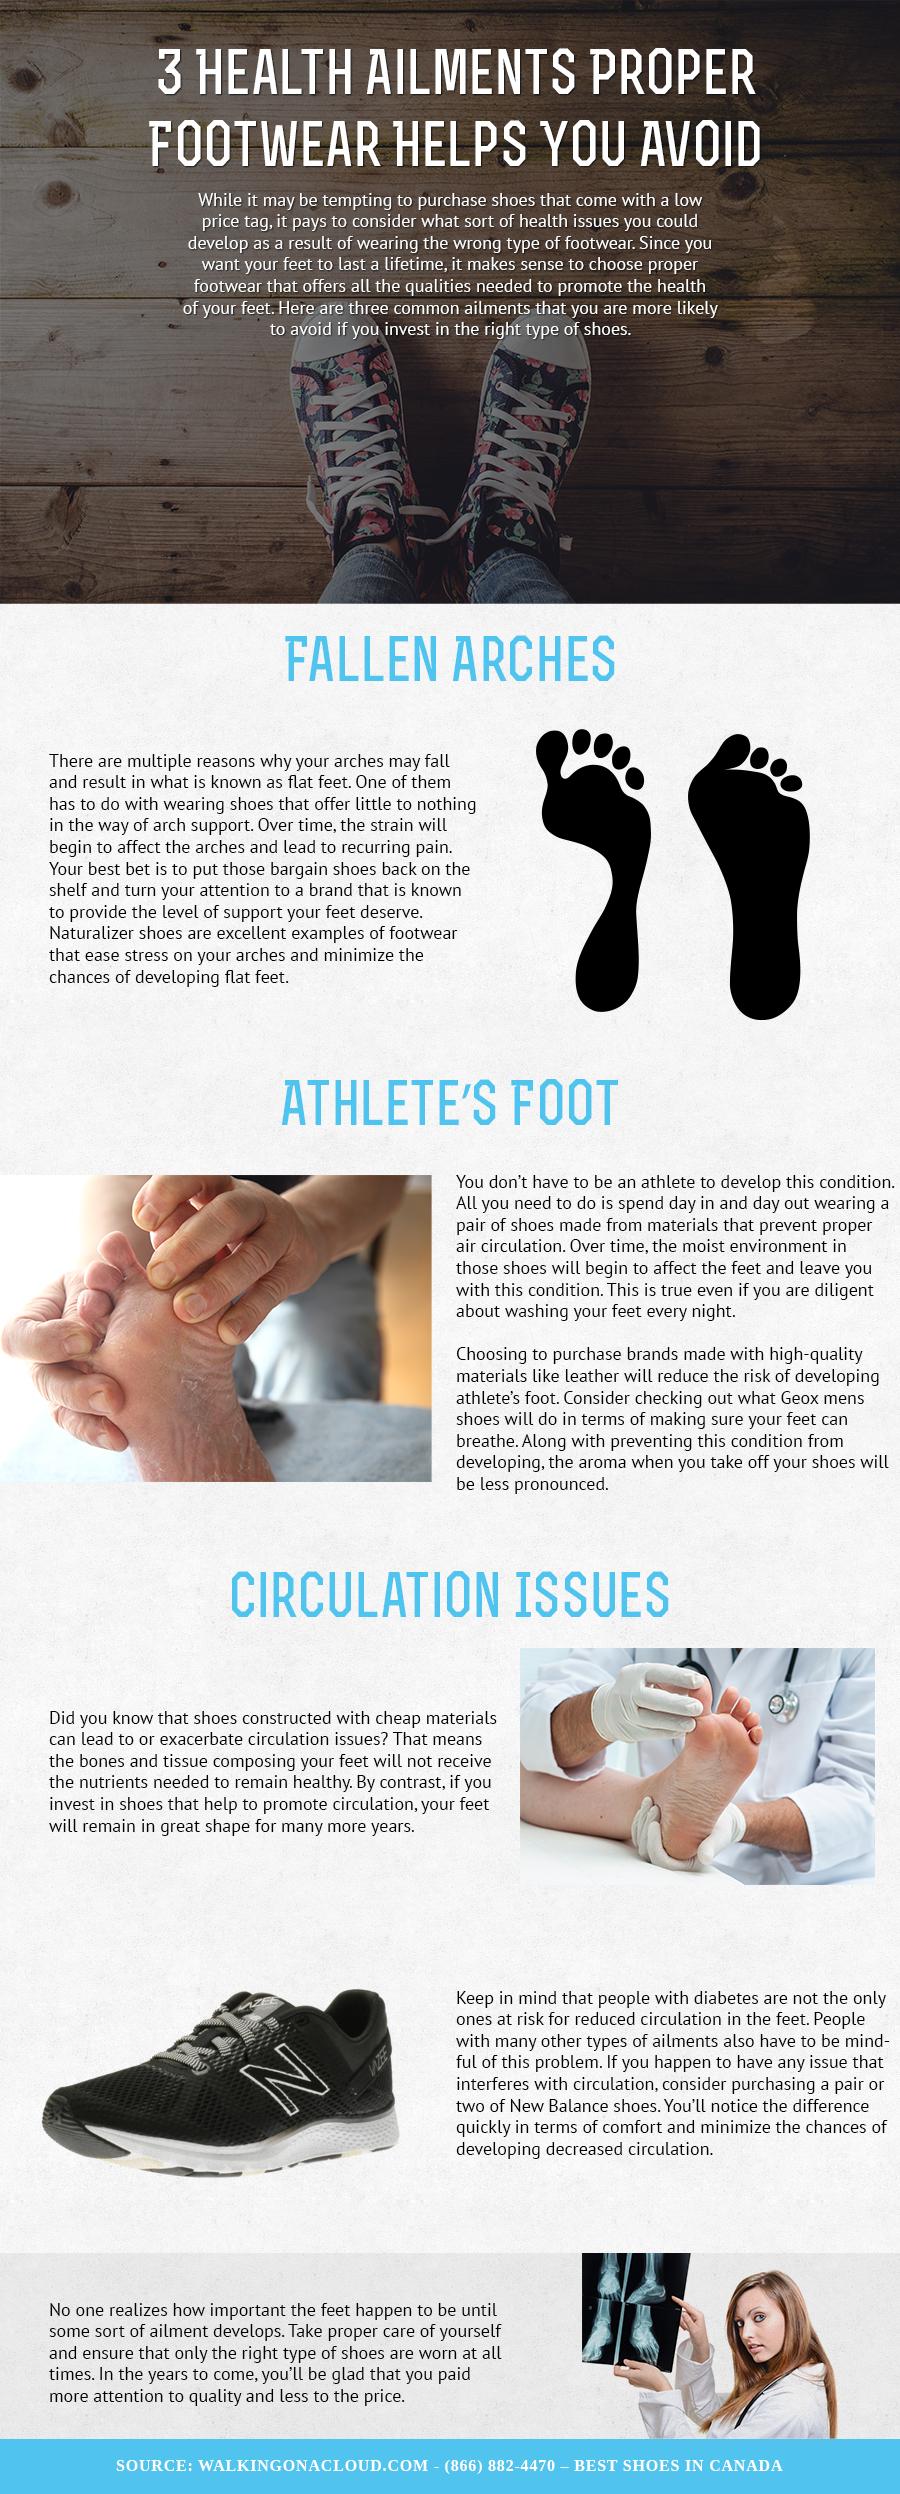 3-Health-Ailments-Proper-Footwear-Helps-You-Avoid